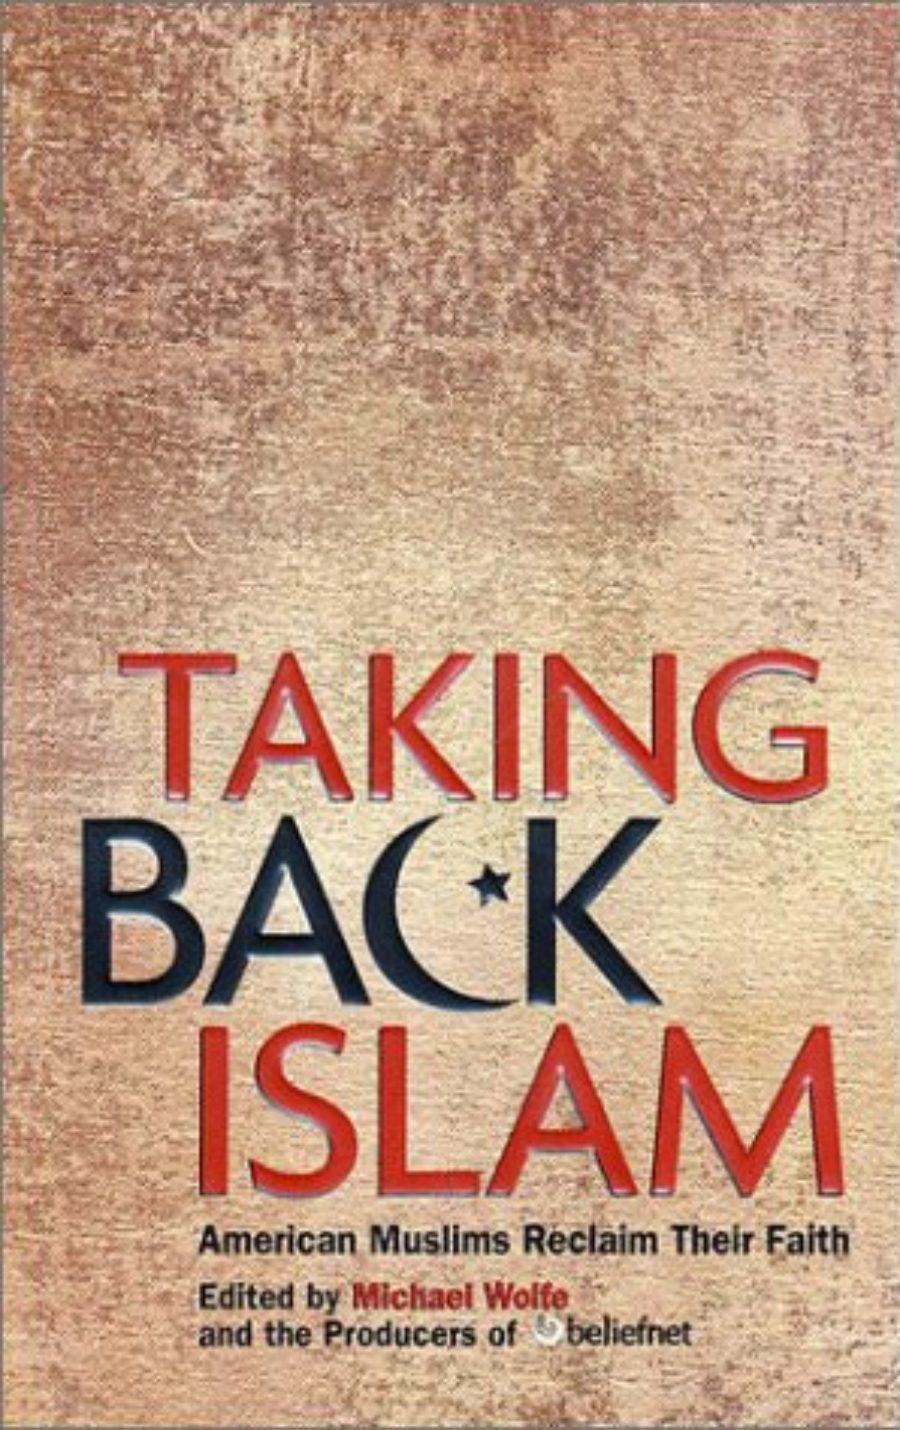 Cover of Taking Back Islam: American Muslims Reclaim Their Faith